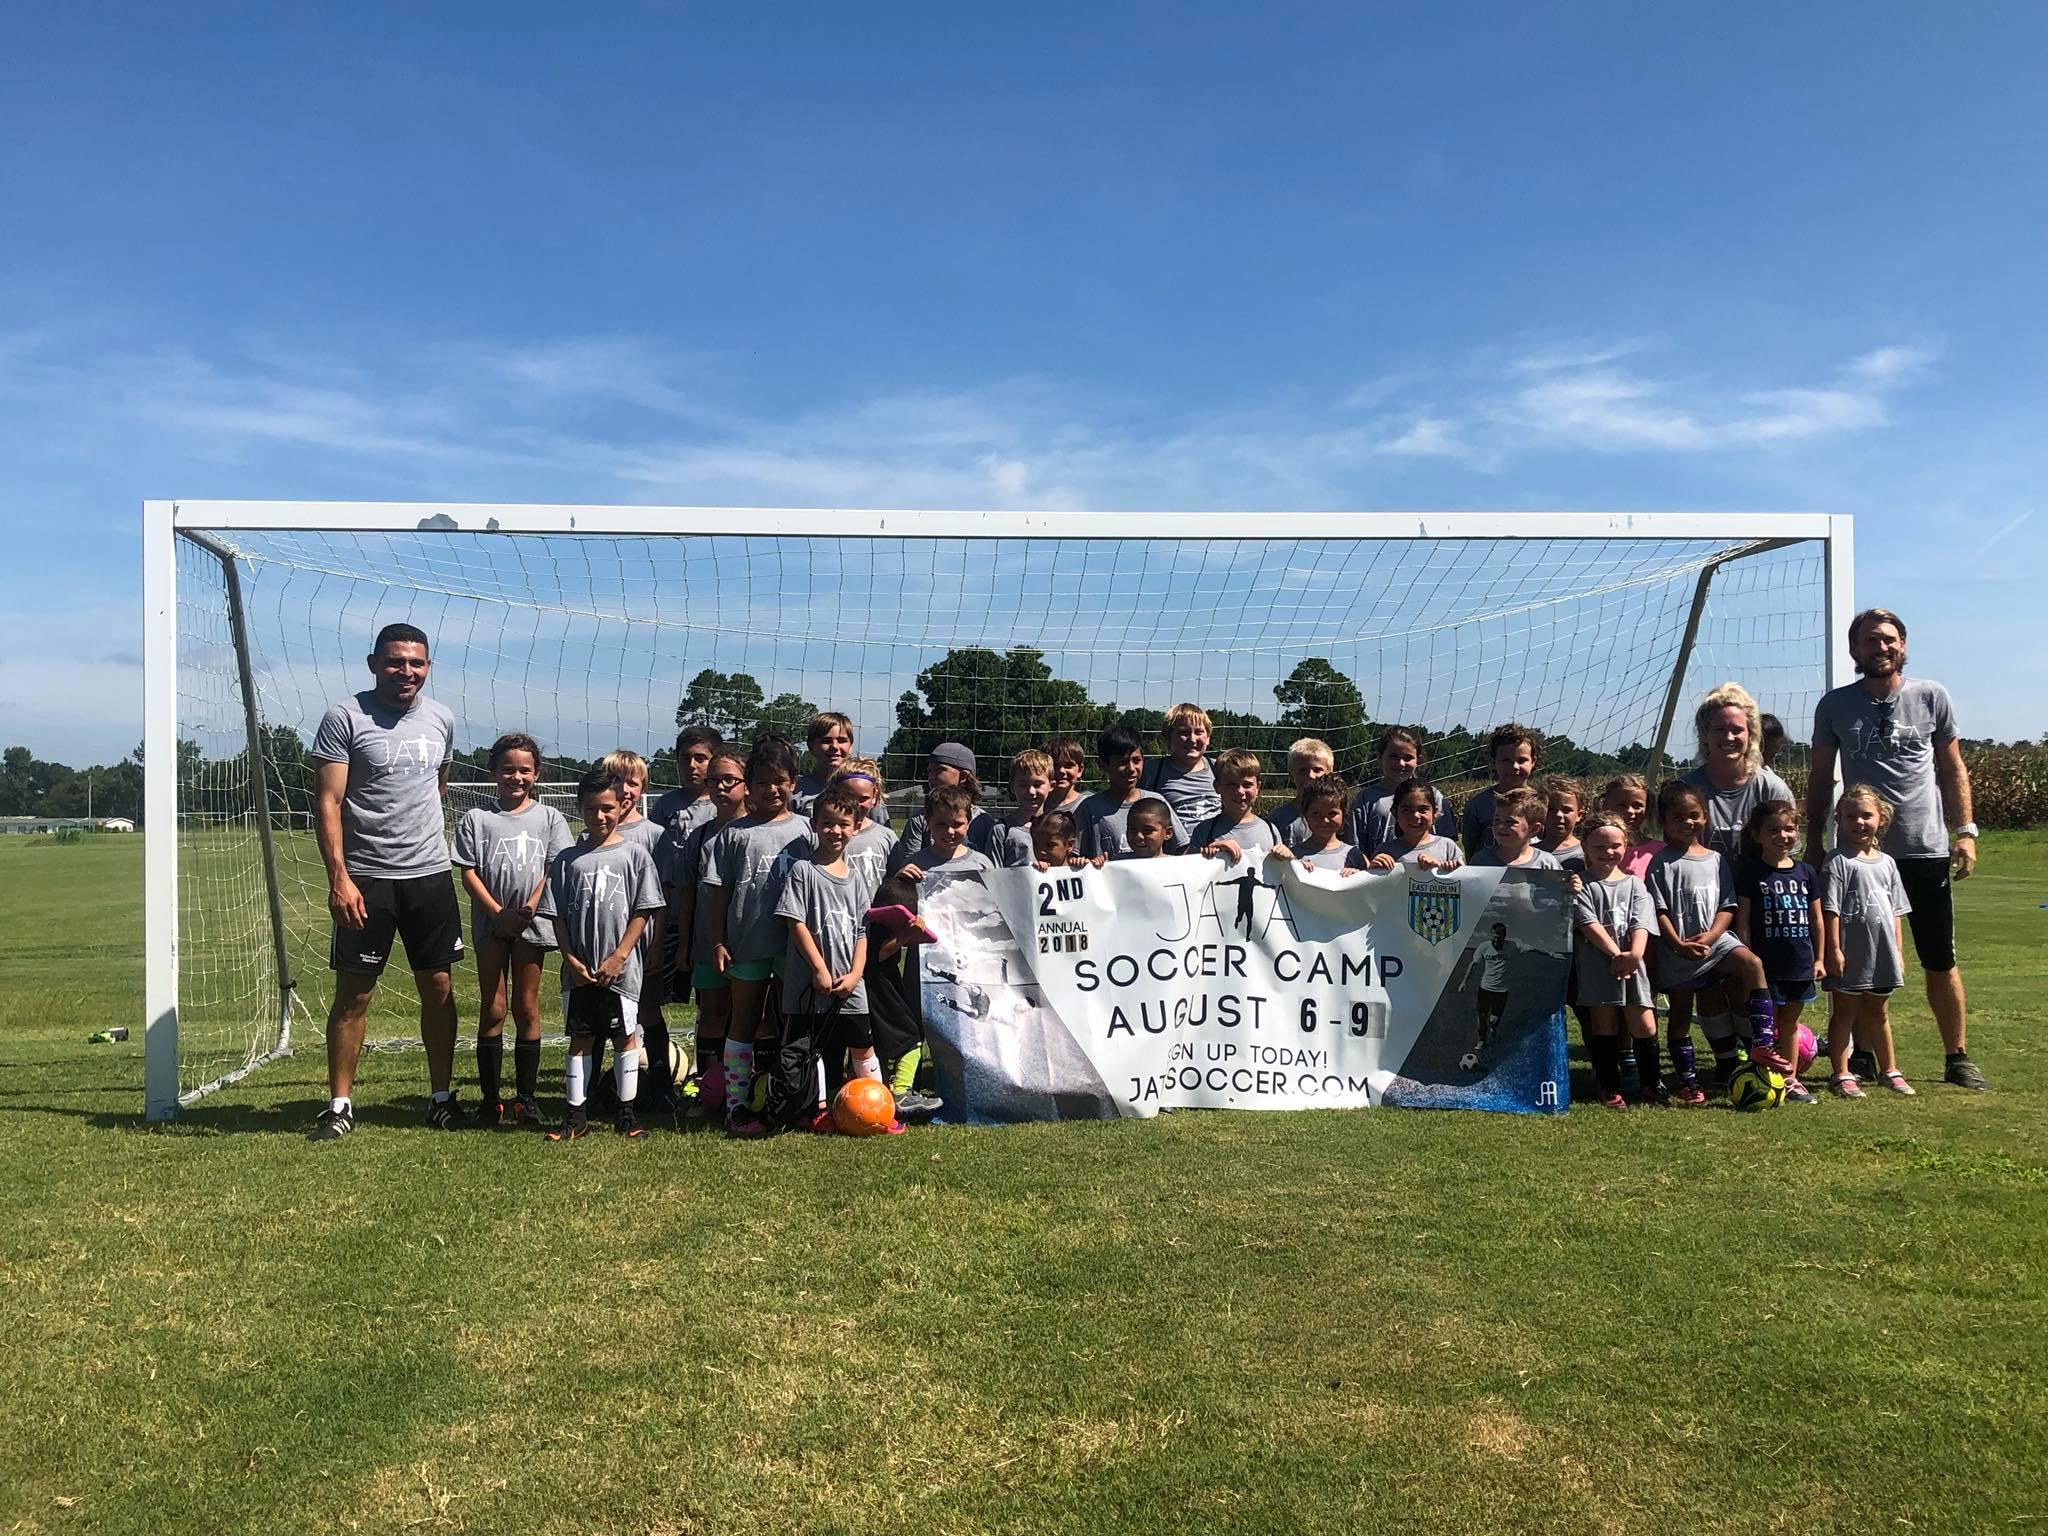 Ava's Story - Jata Soccer Camp